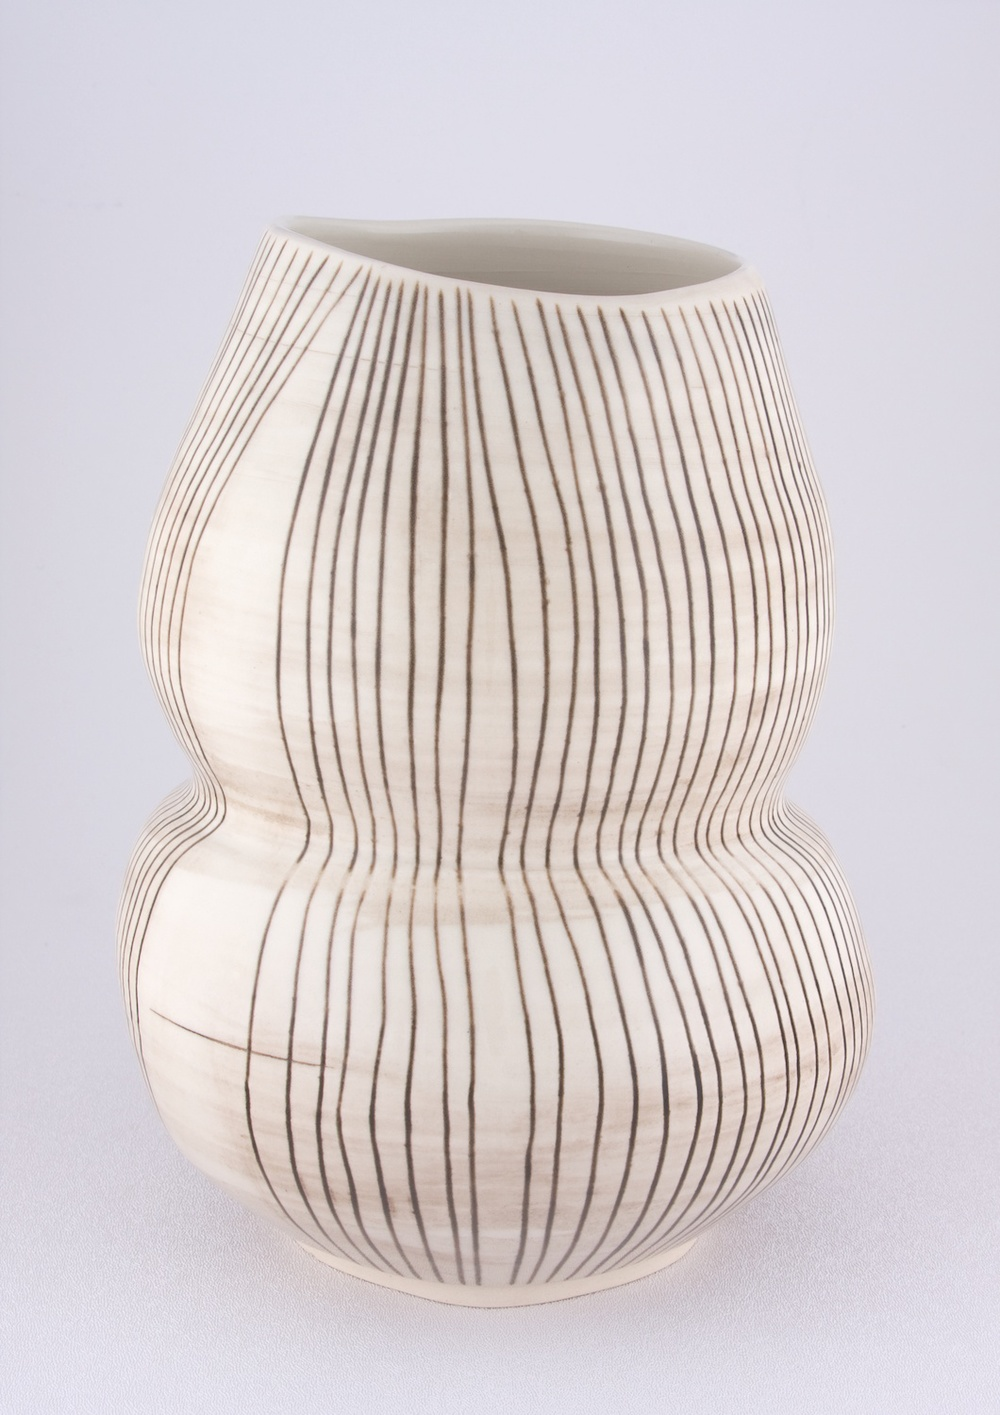 Shio Kusaka  Untitled (double black stripe)  2009 Porcelain 10h x 7 ¾w in SK043